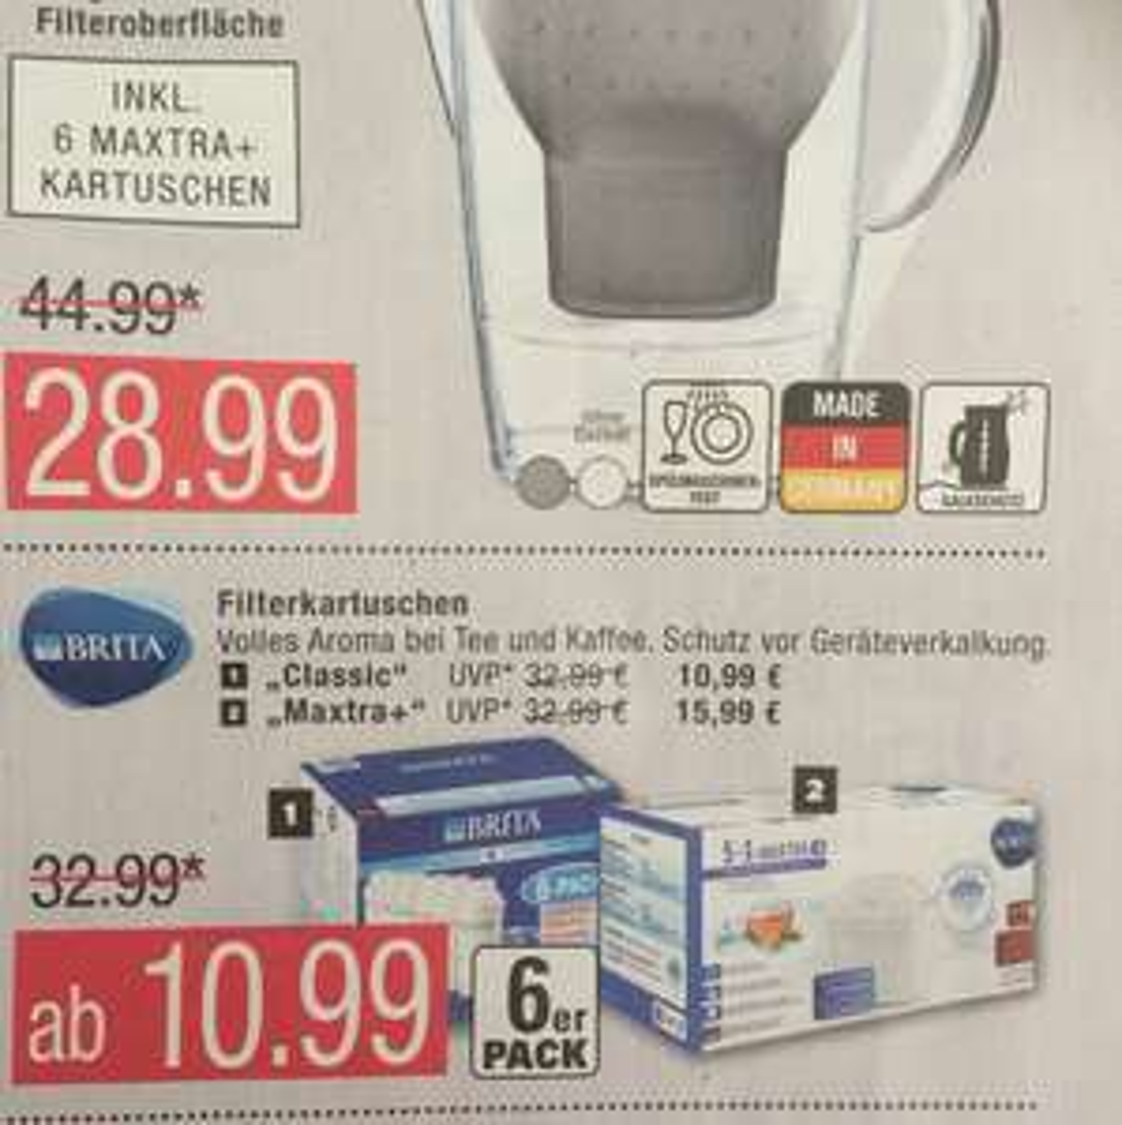 Brita 6er Pack Maxtra+ 15,99€/ Classic 10,99€ Marktkauf Hamburg